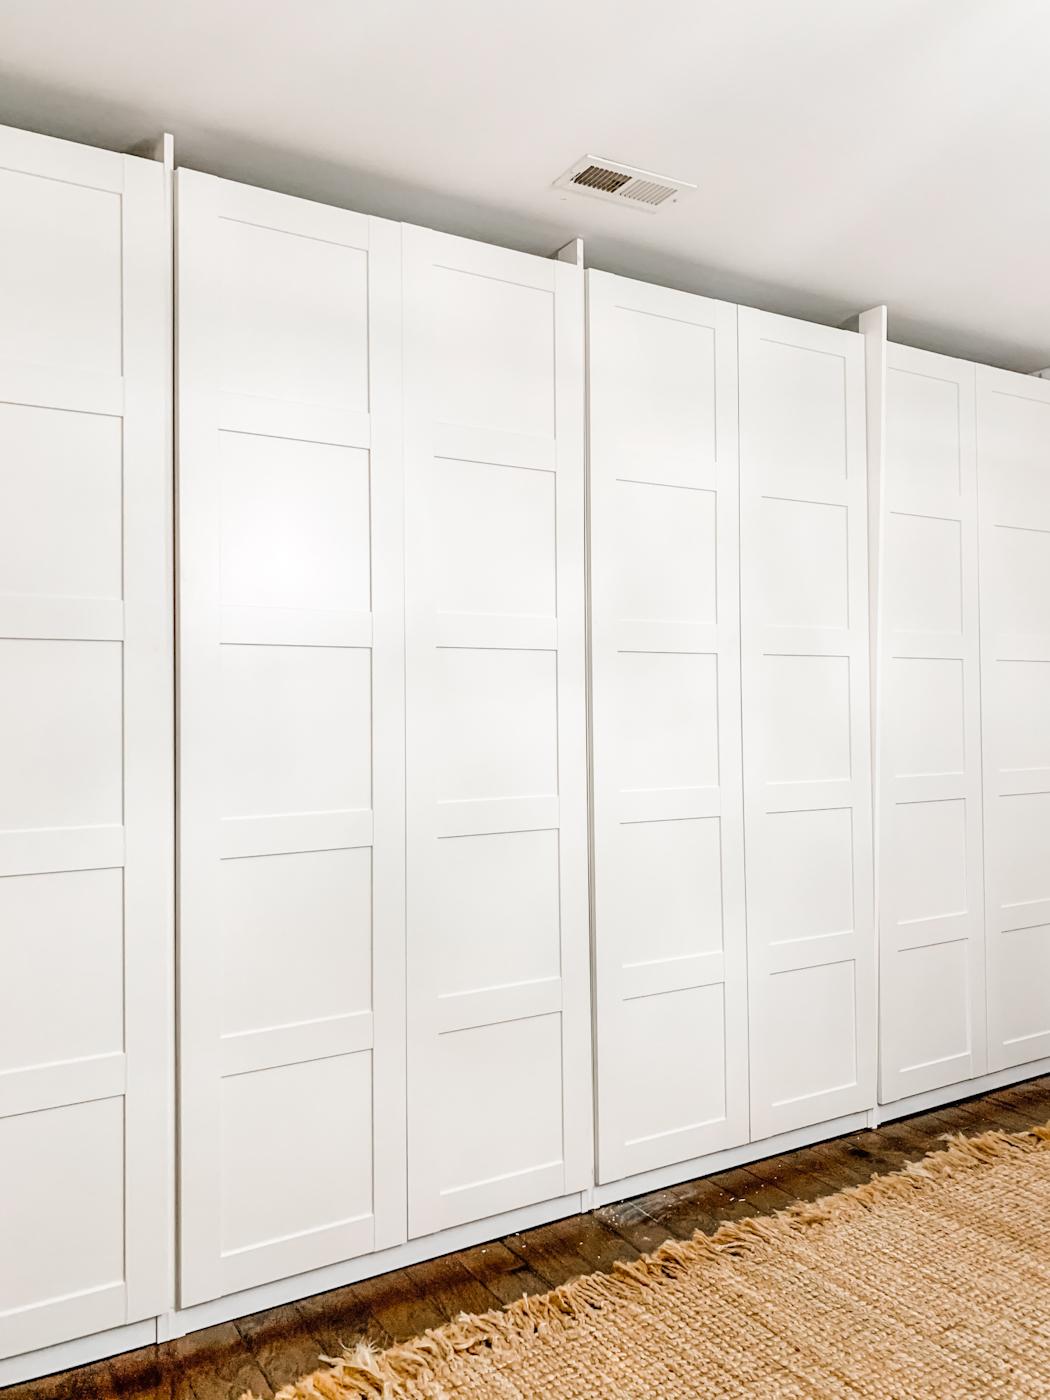 ikea-pax-closet-wall-wardrobe-design